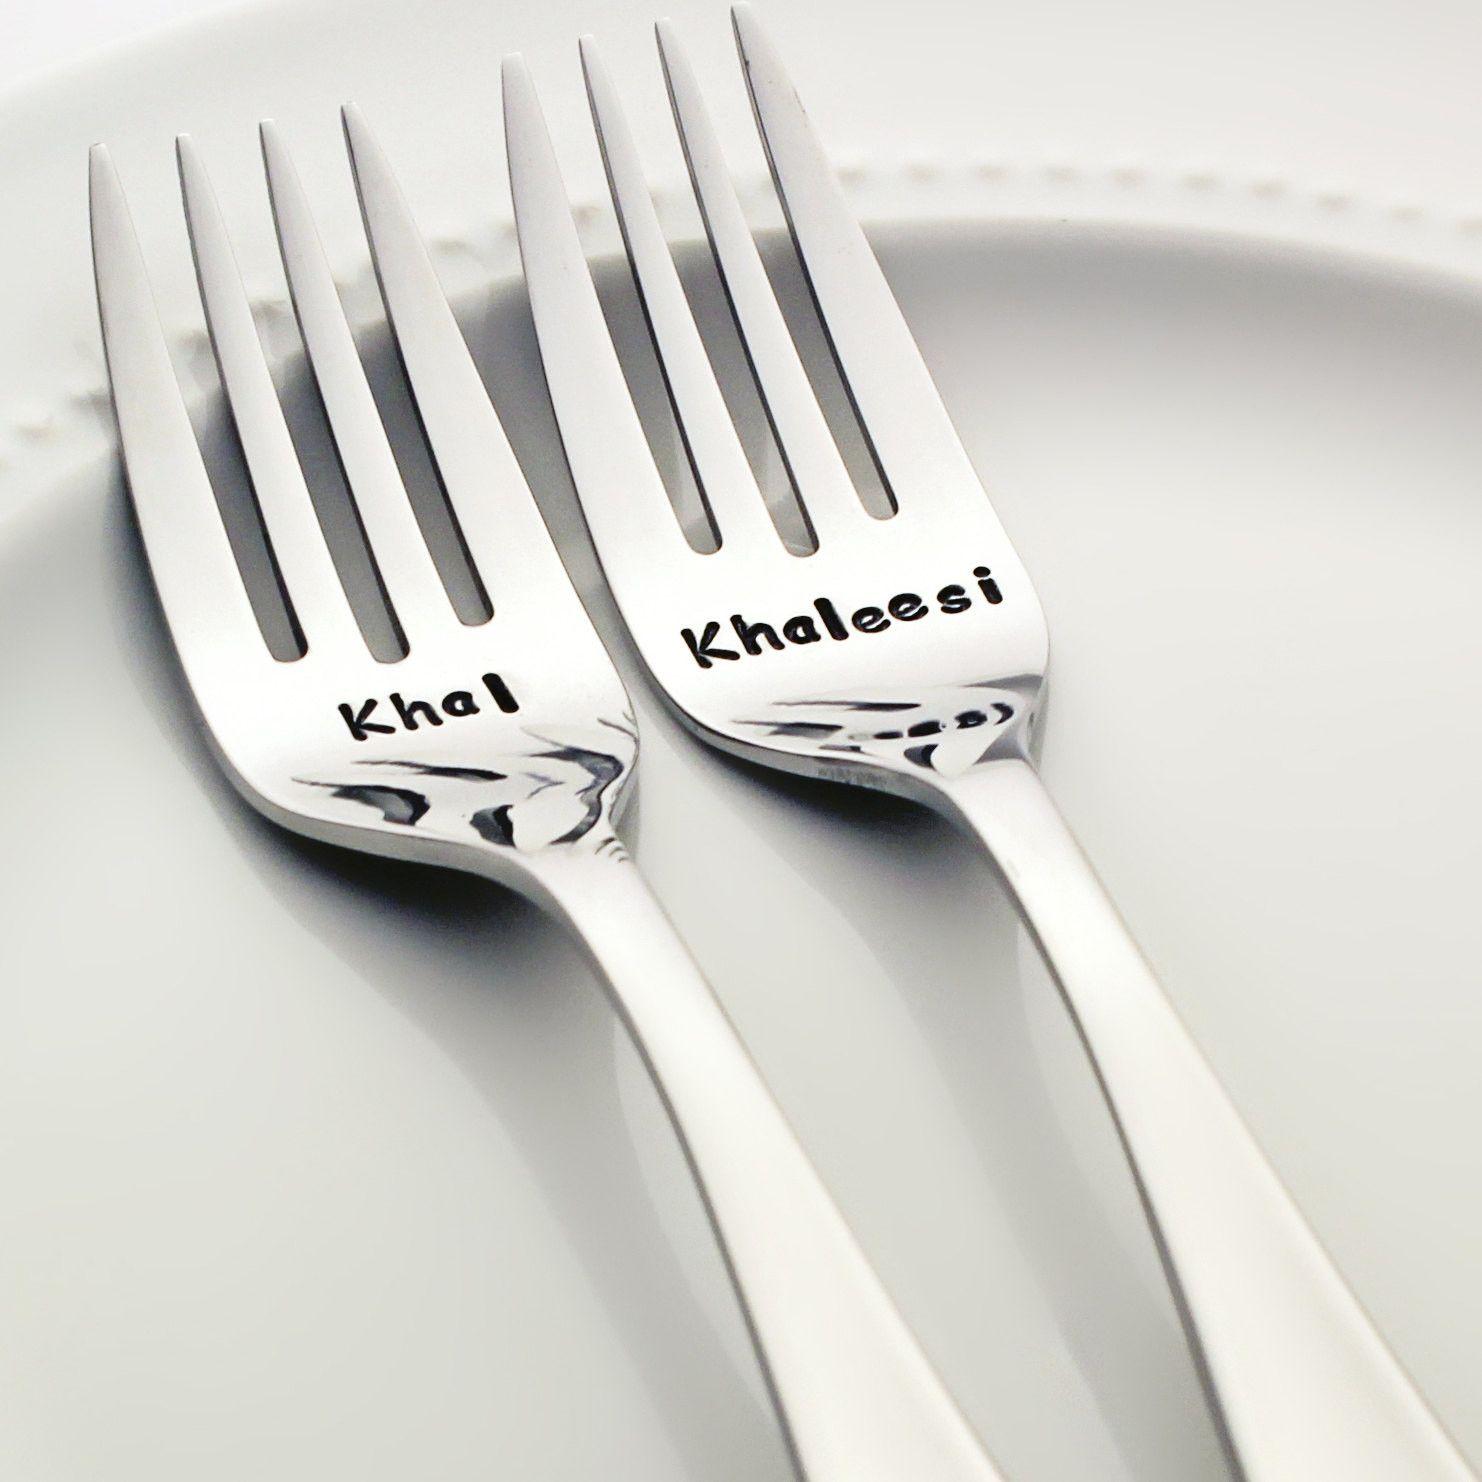 Khal / Khaleesi - Stamped Wedding Forks for Game of Thrones Weddings ...